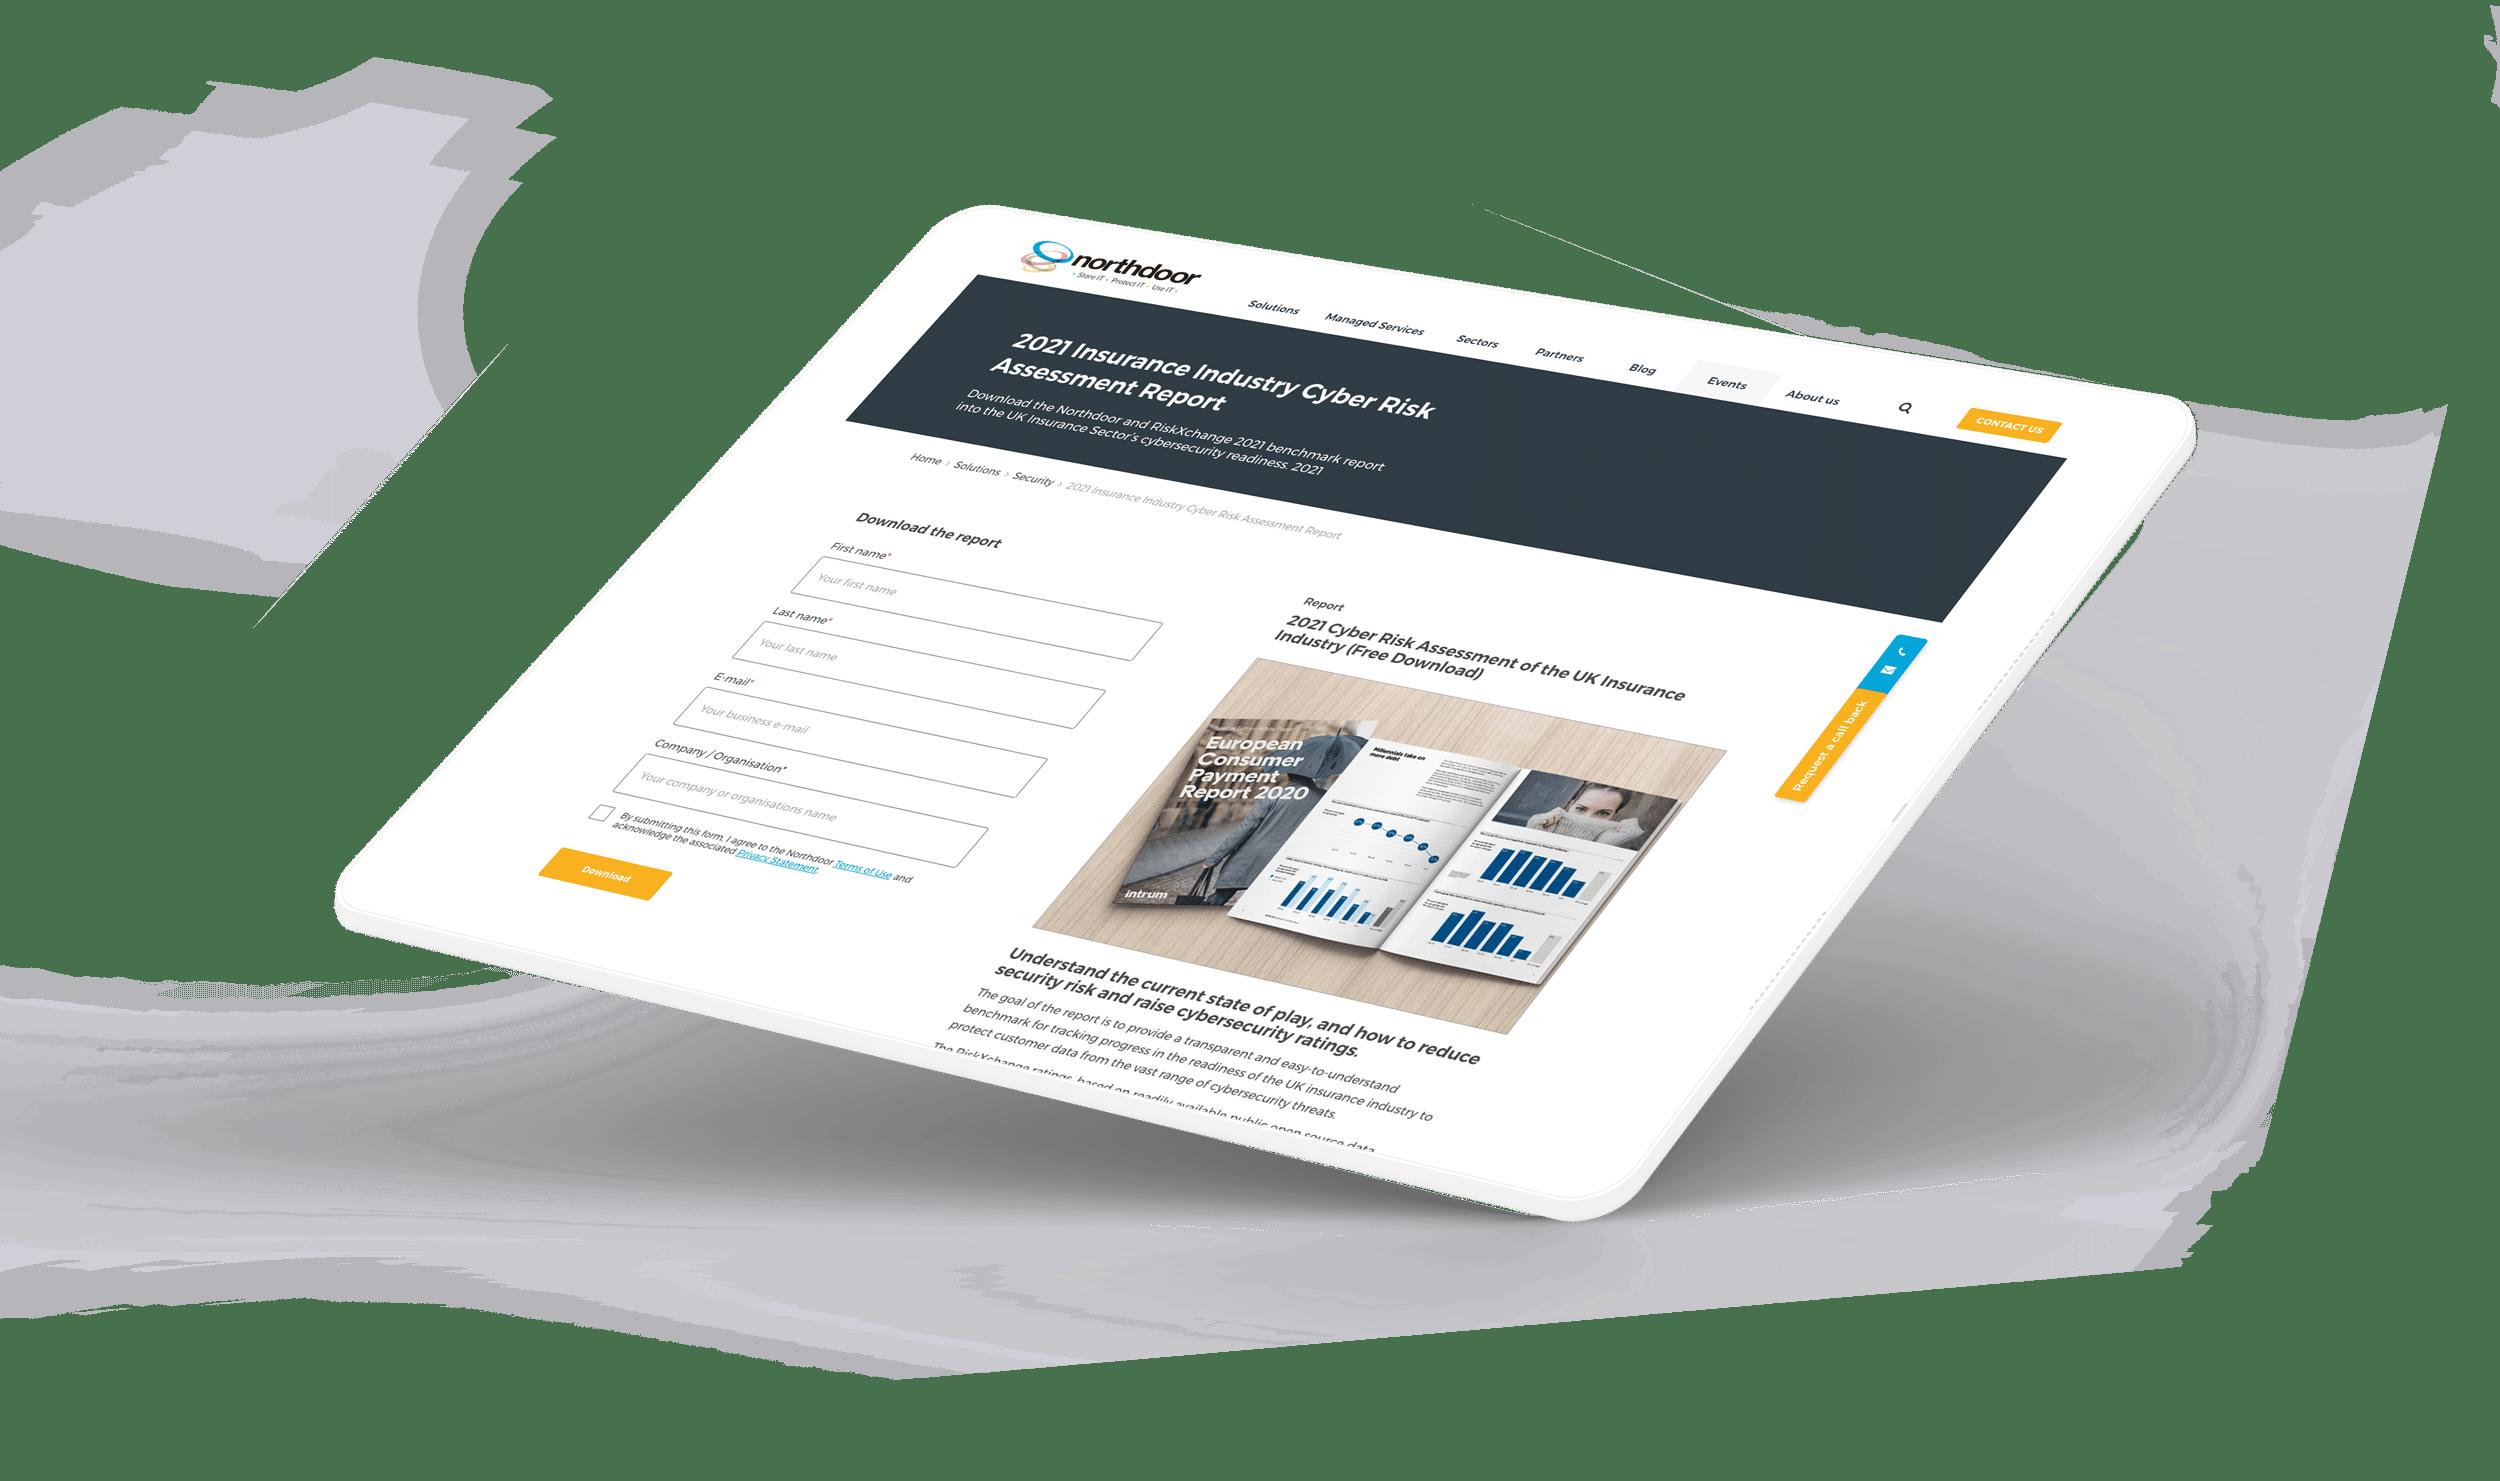 Landing page for inbound marketing